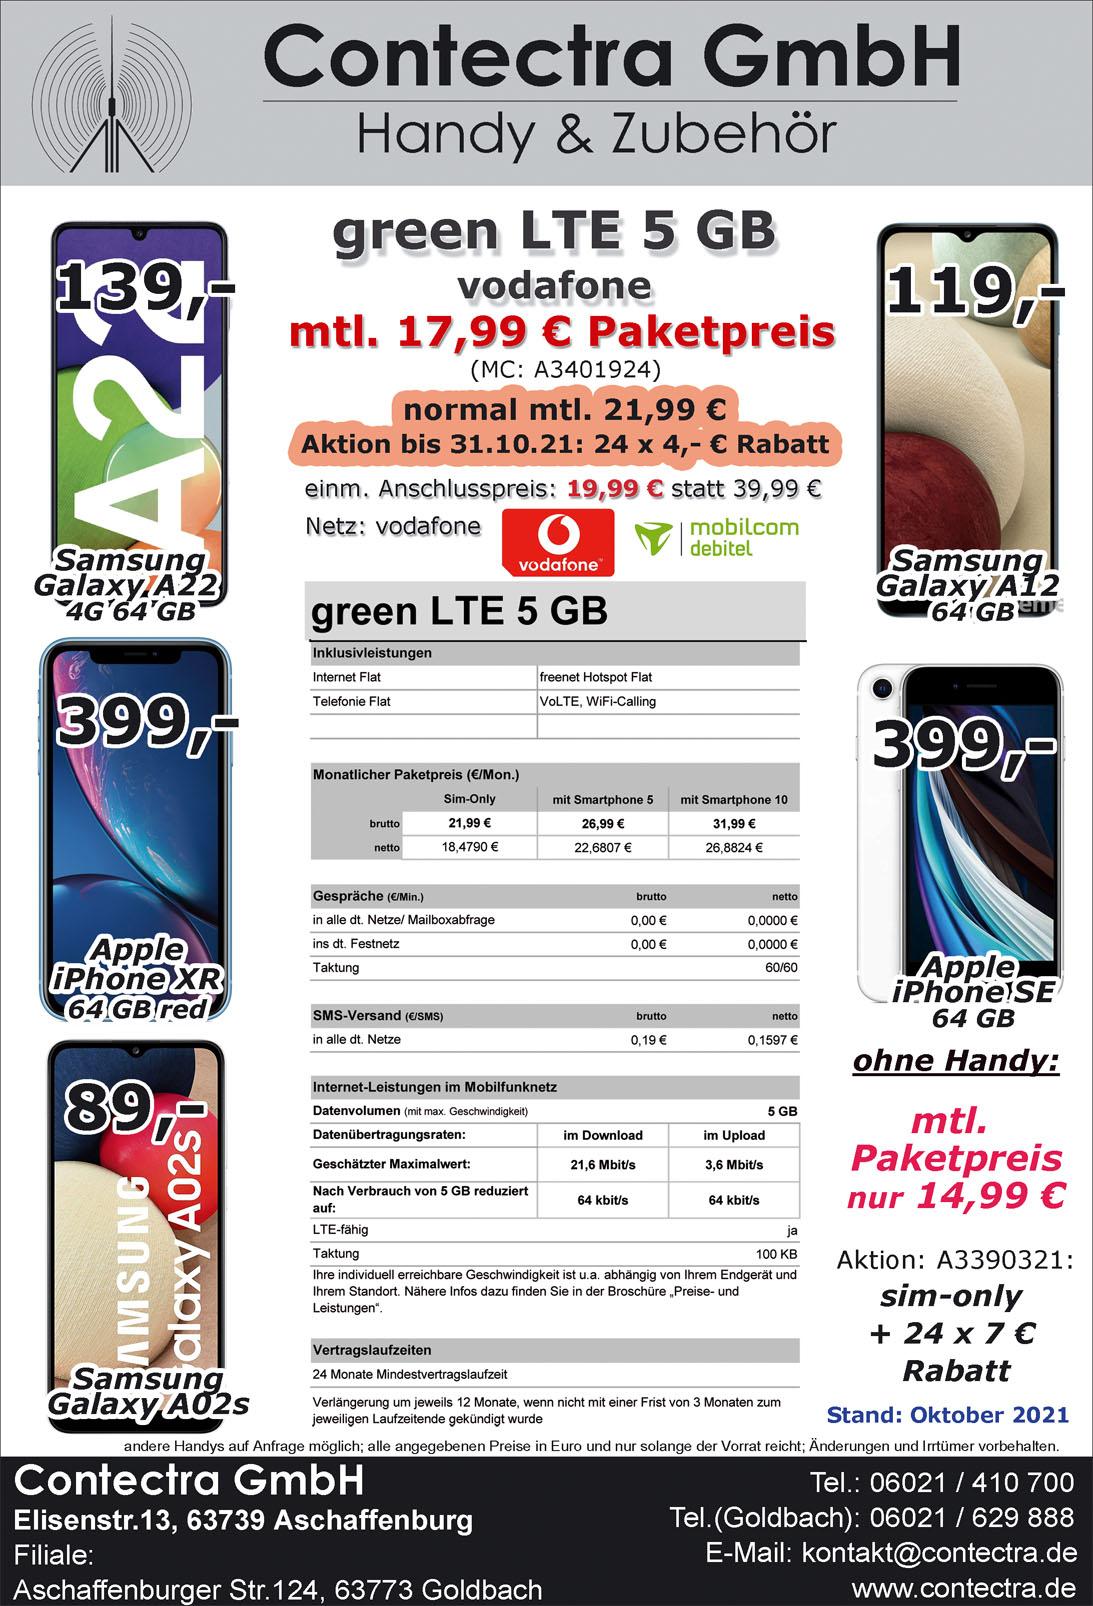 green 5 GB vodafone Okt21 Kopie